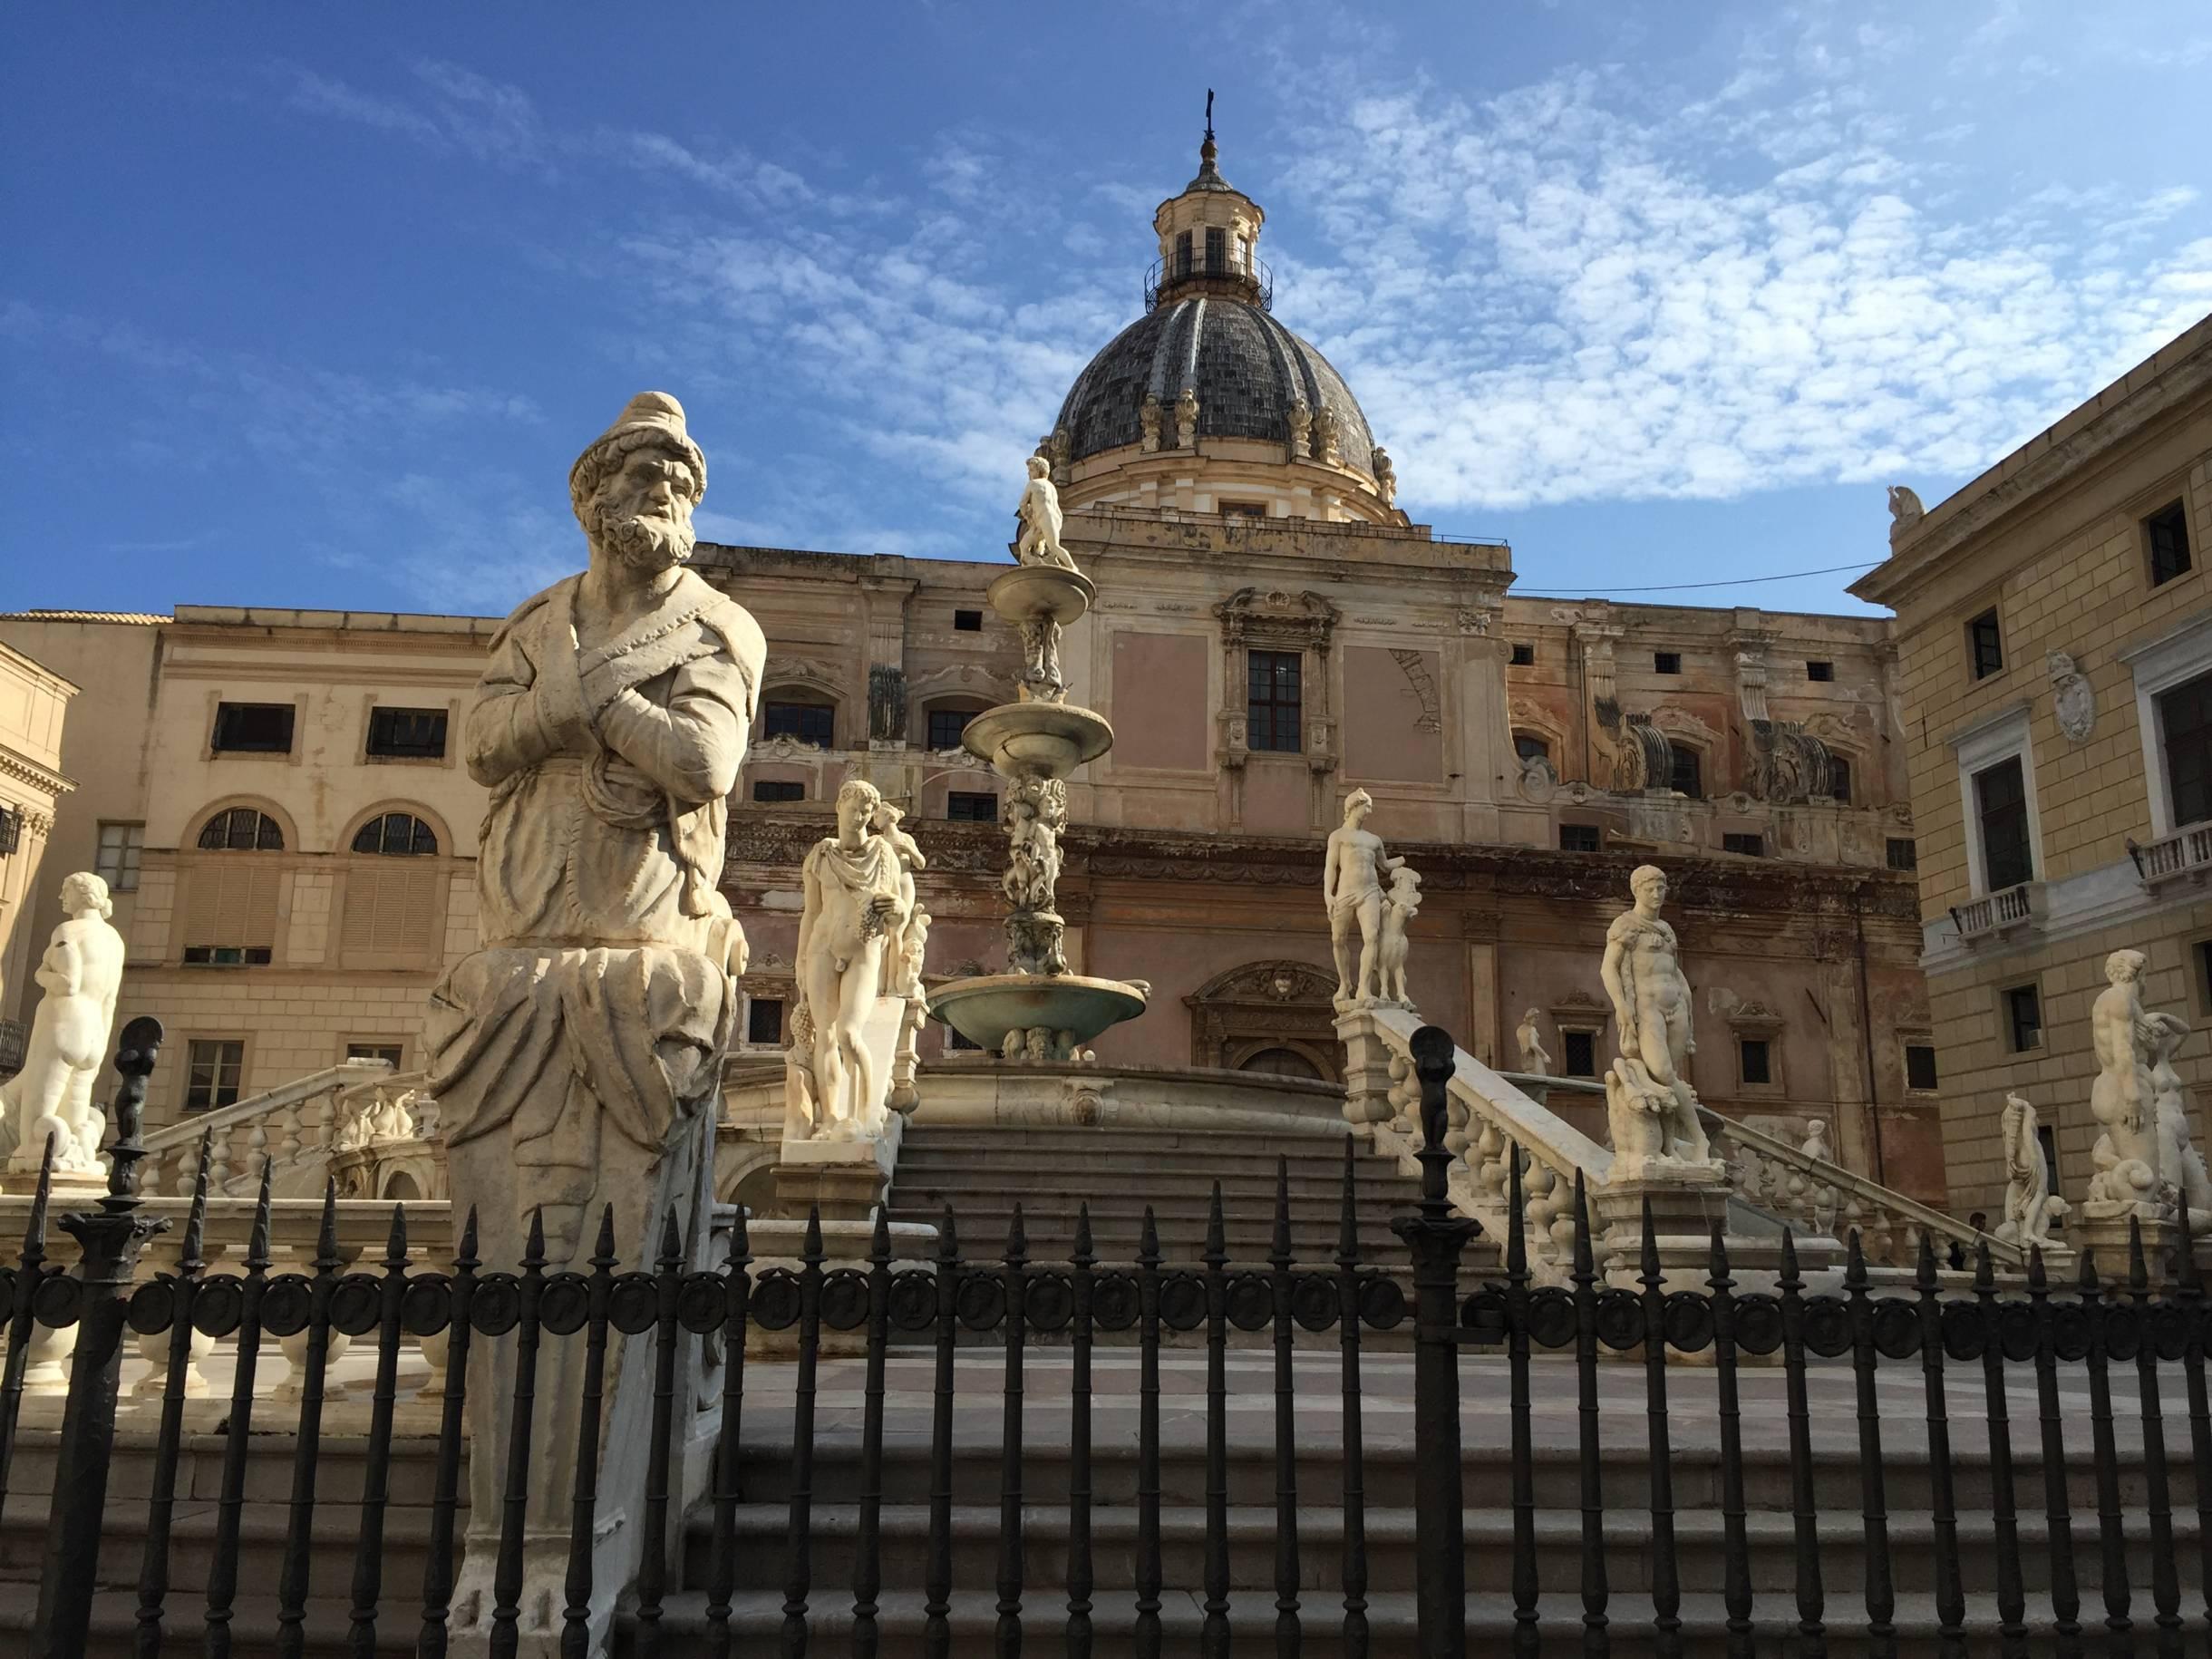 Visit Palermo, Sicily to see the beautiful Piazza Pretoria